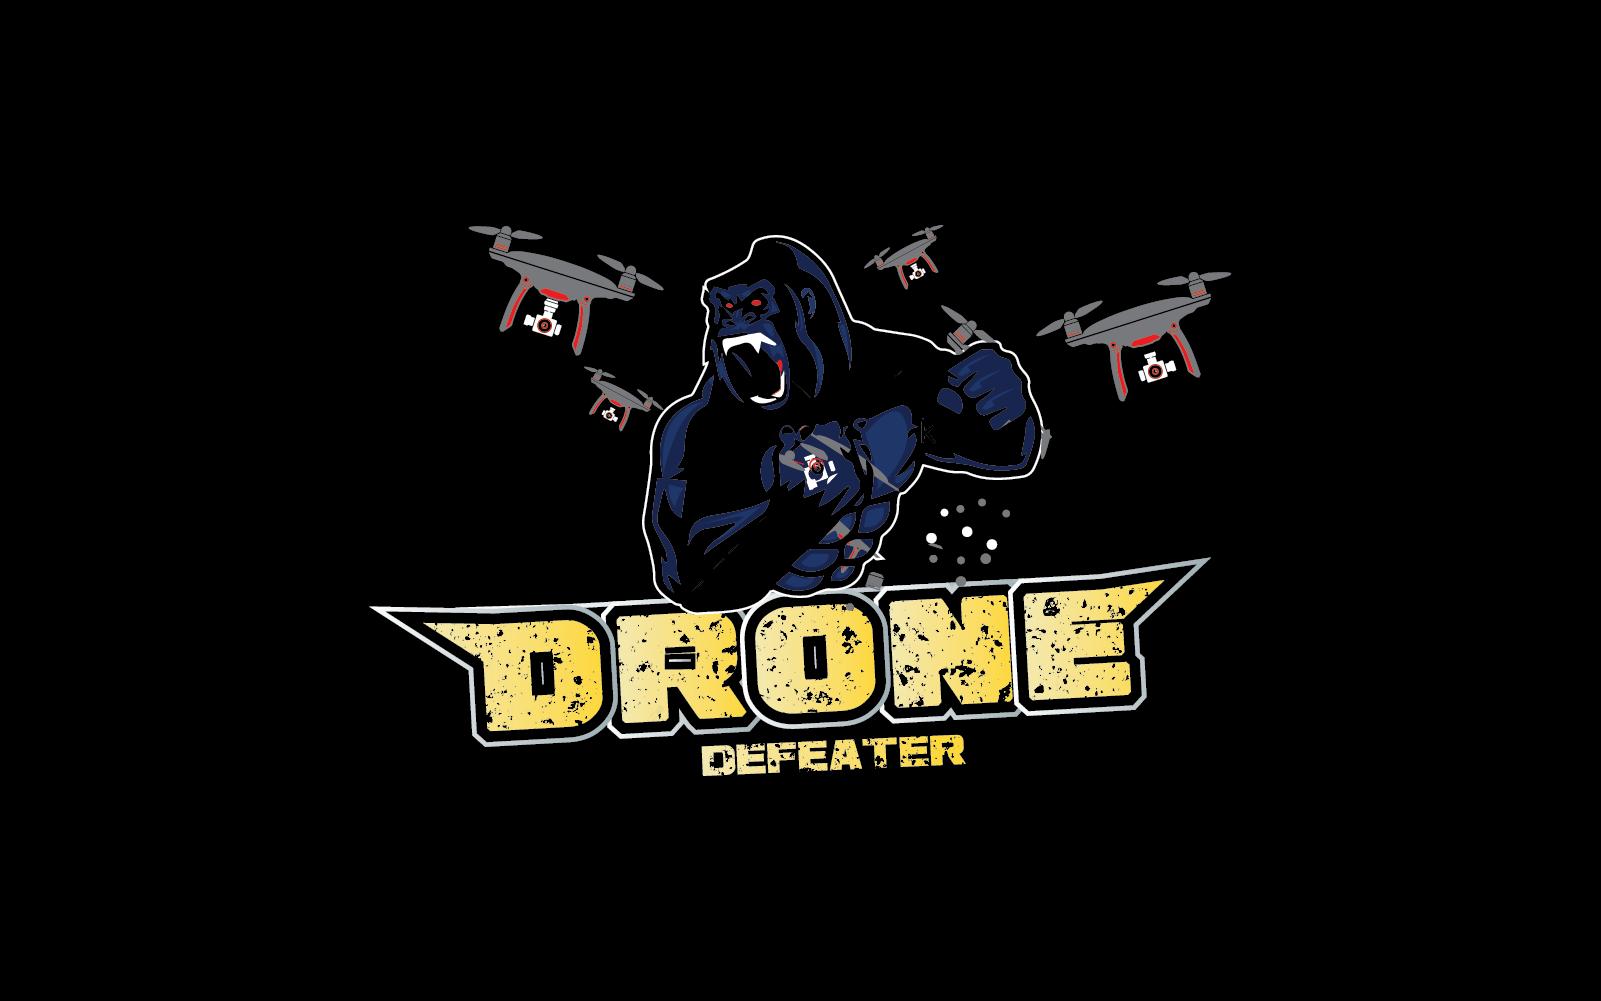 Logo Design by pojas12 - Entry No. 39 in the Logo Design Contest Artistic Logo Design for Drone Defeater.